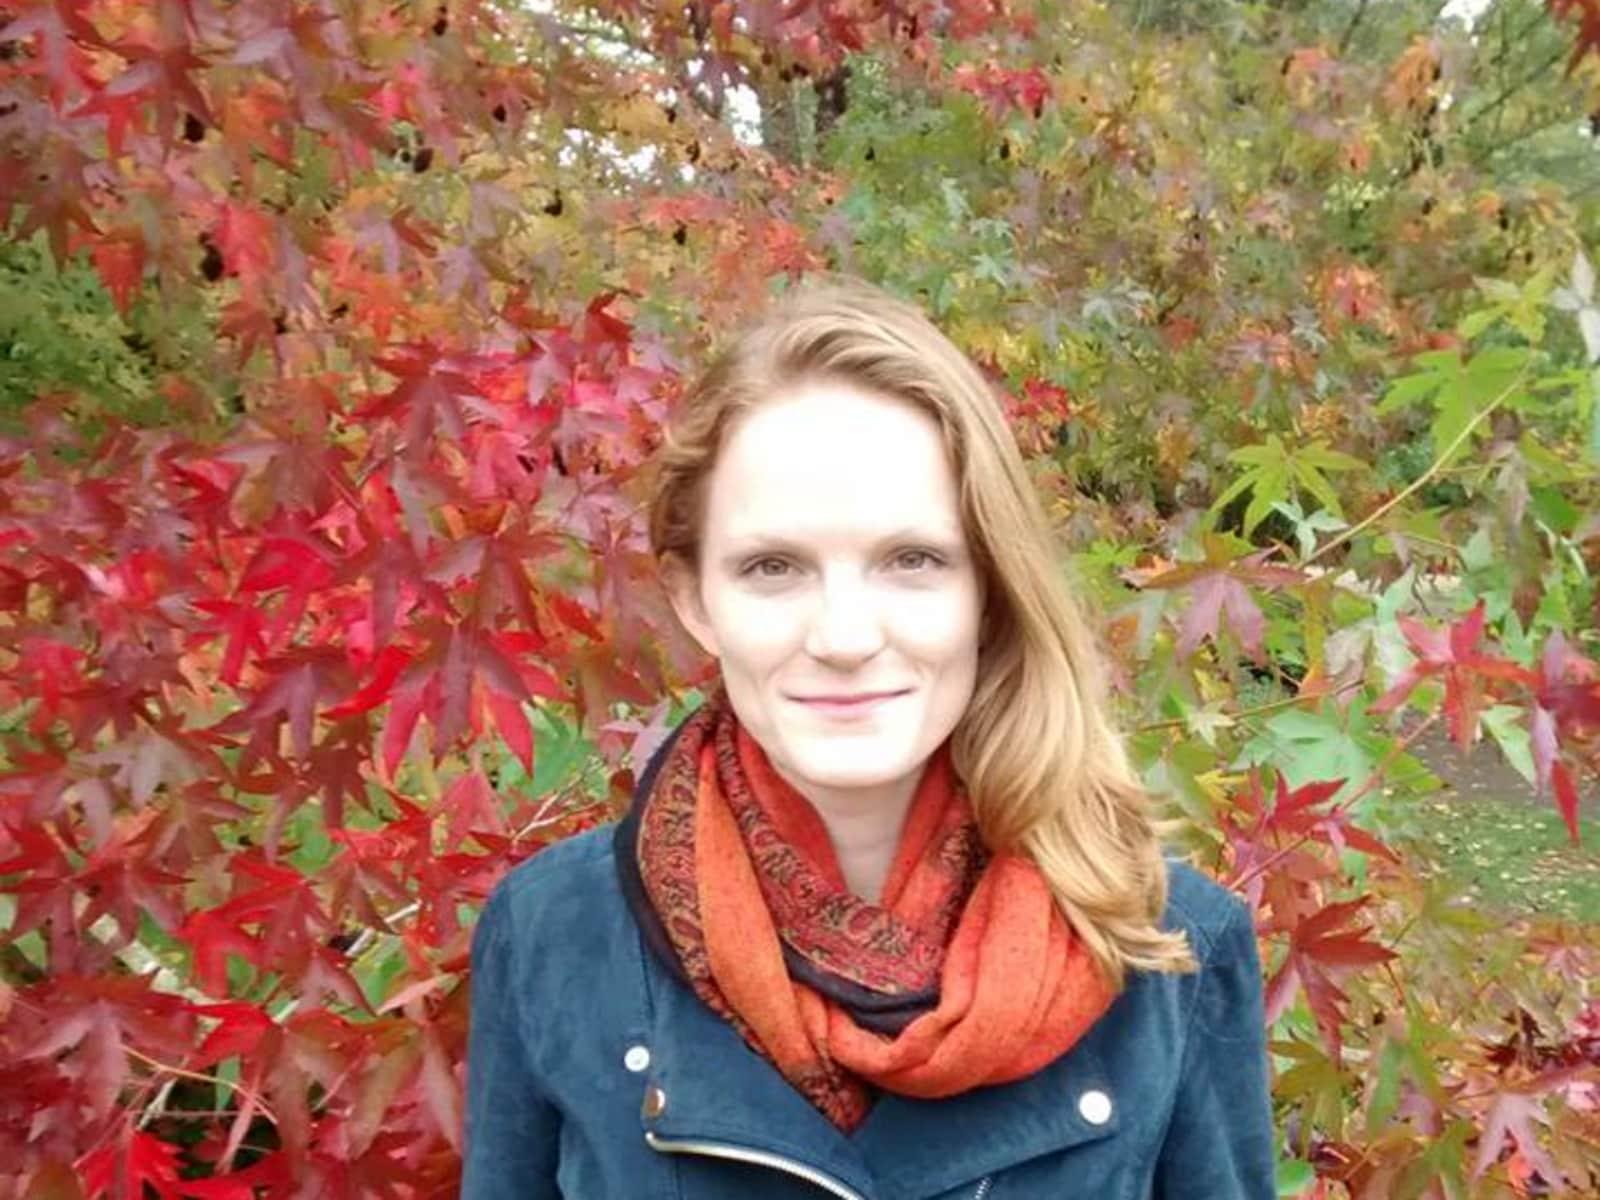 Eva from Cambridge, United Kingdom